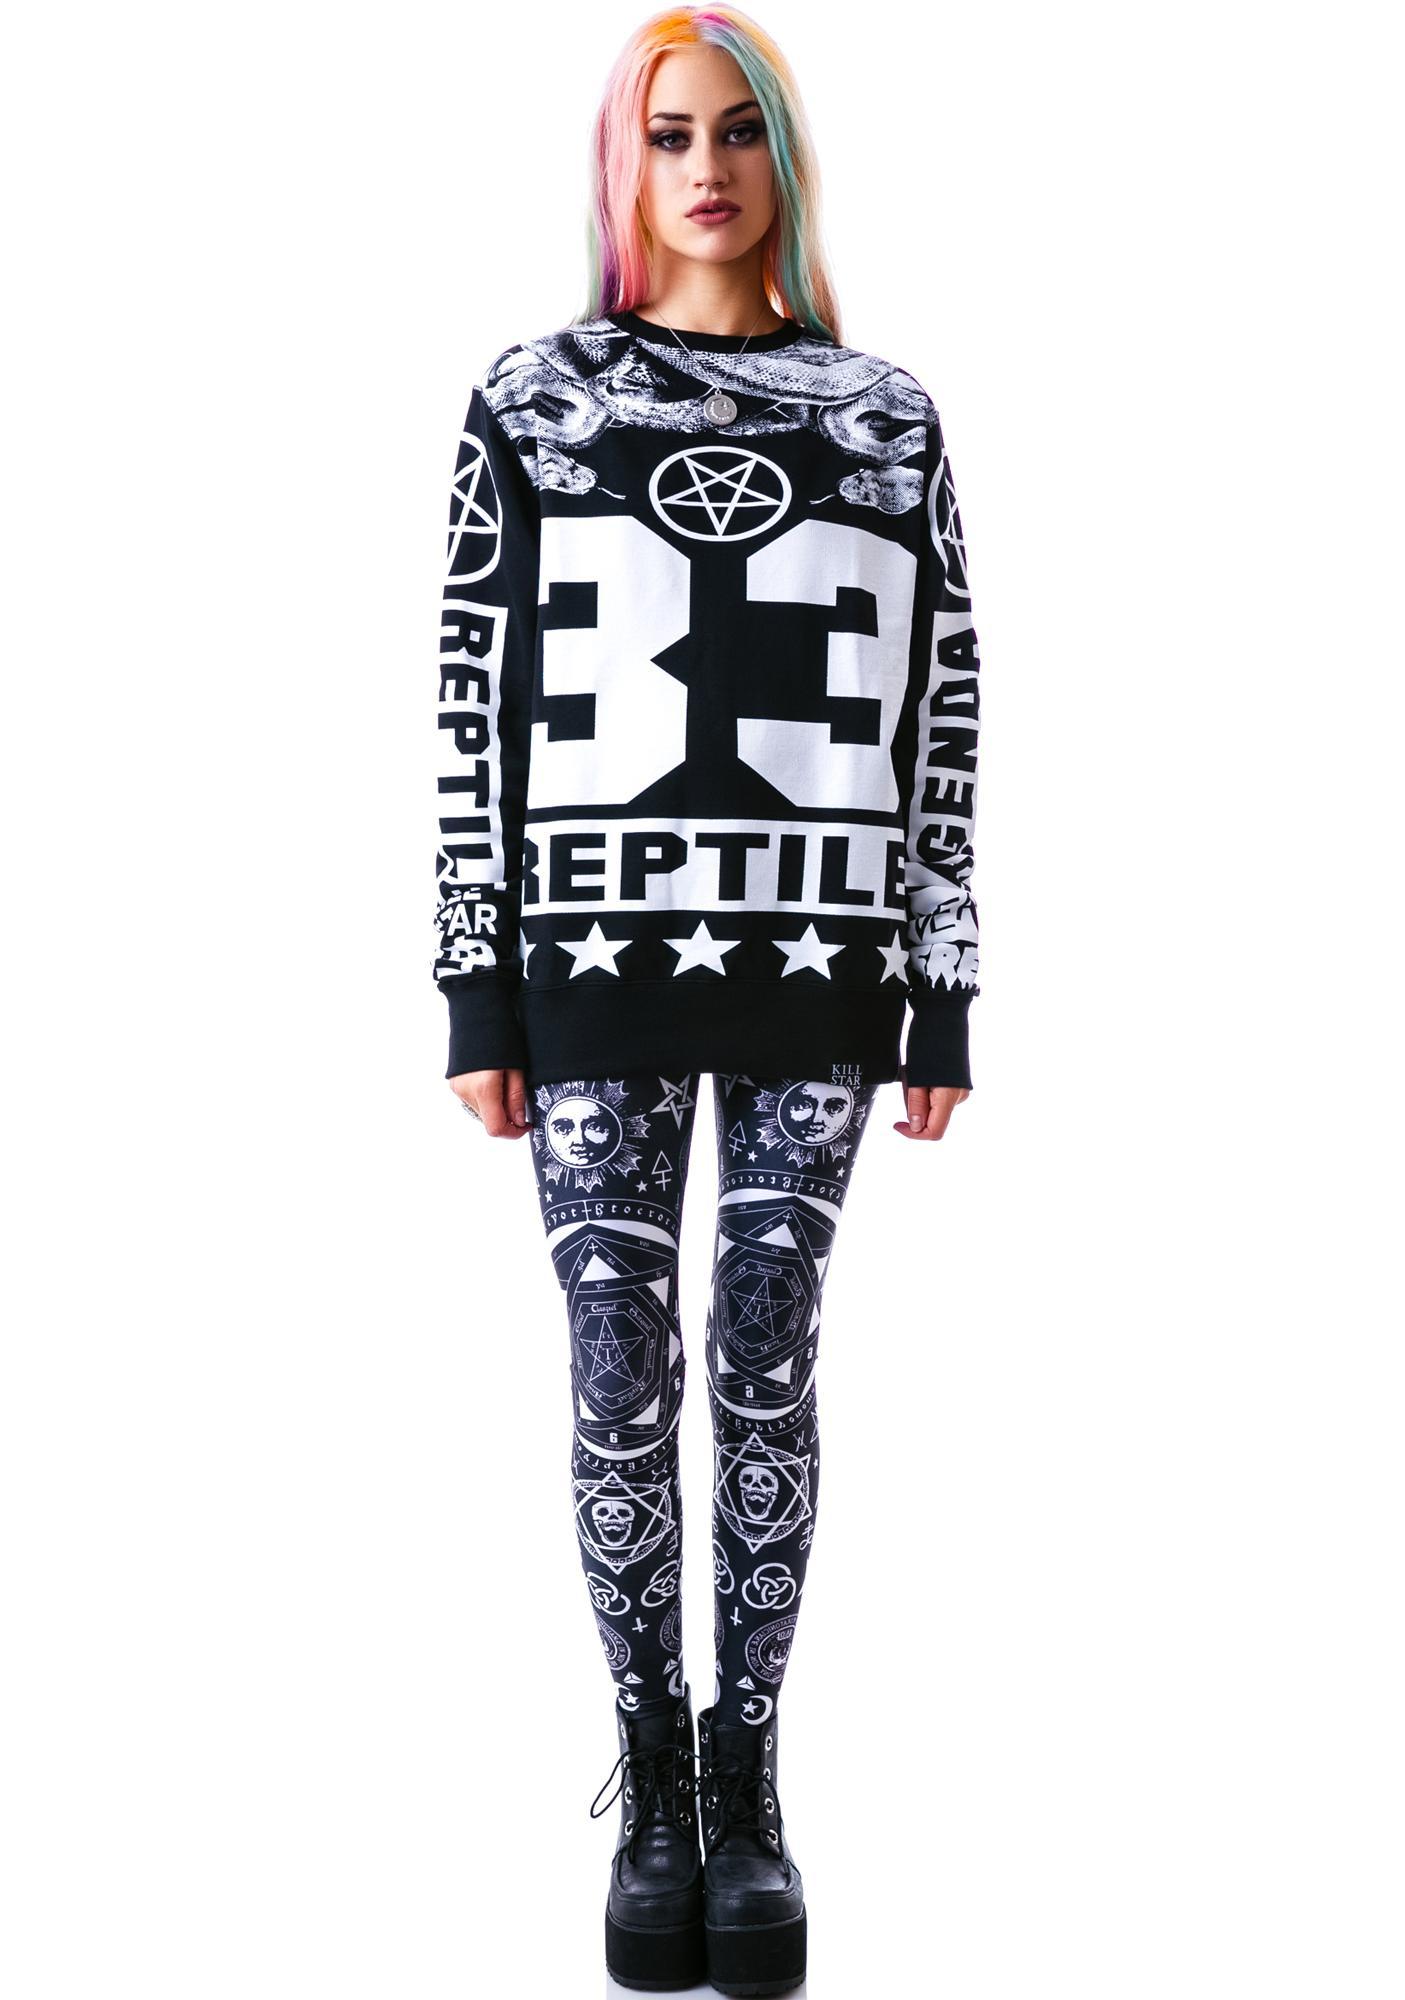 Killstar Reptile Sweatshirt